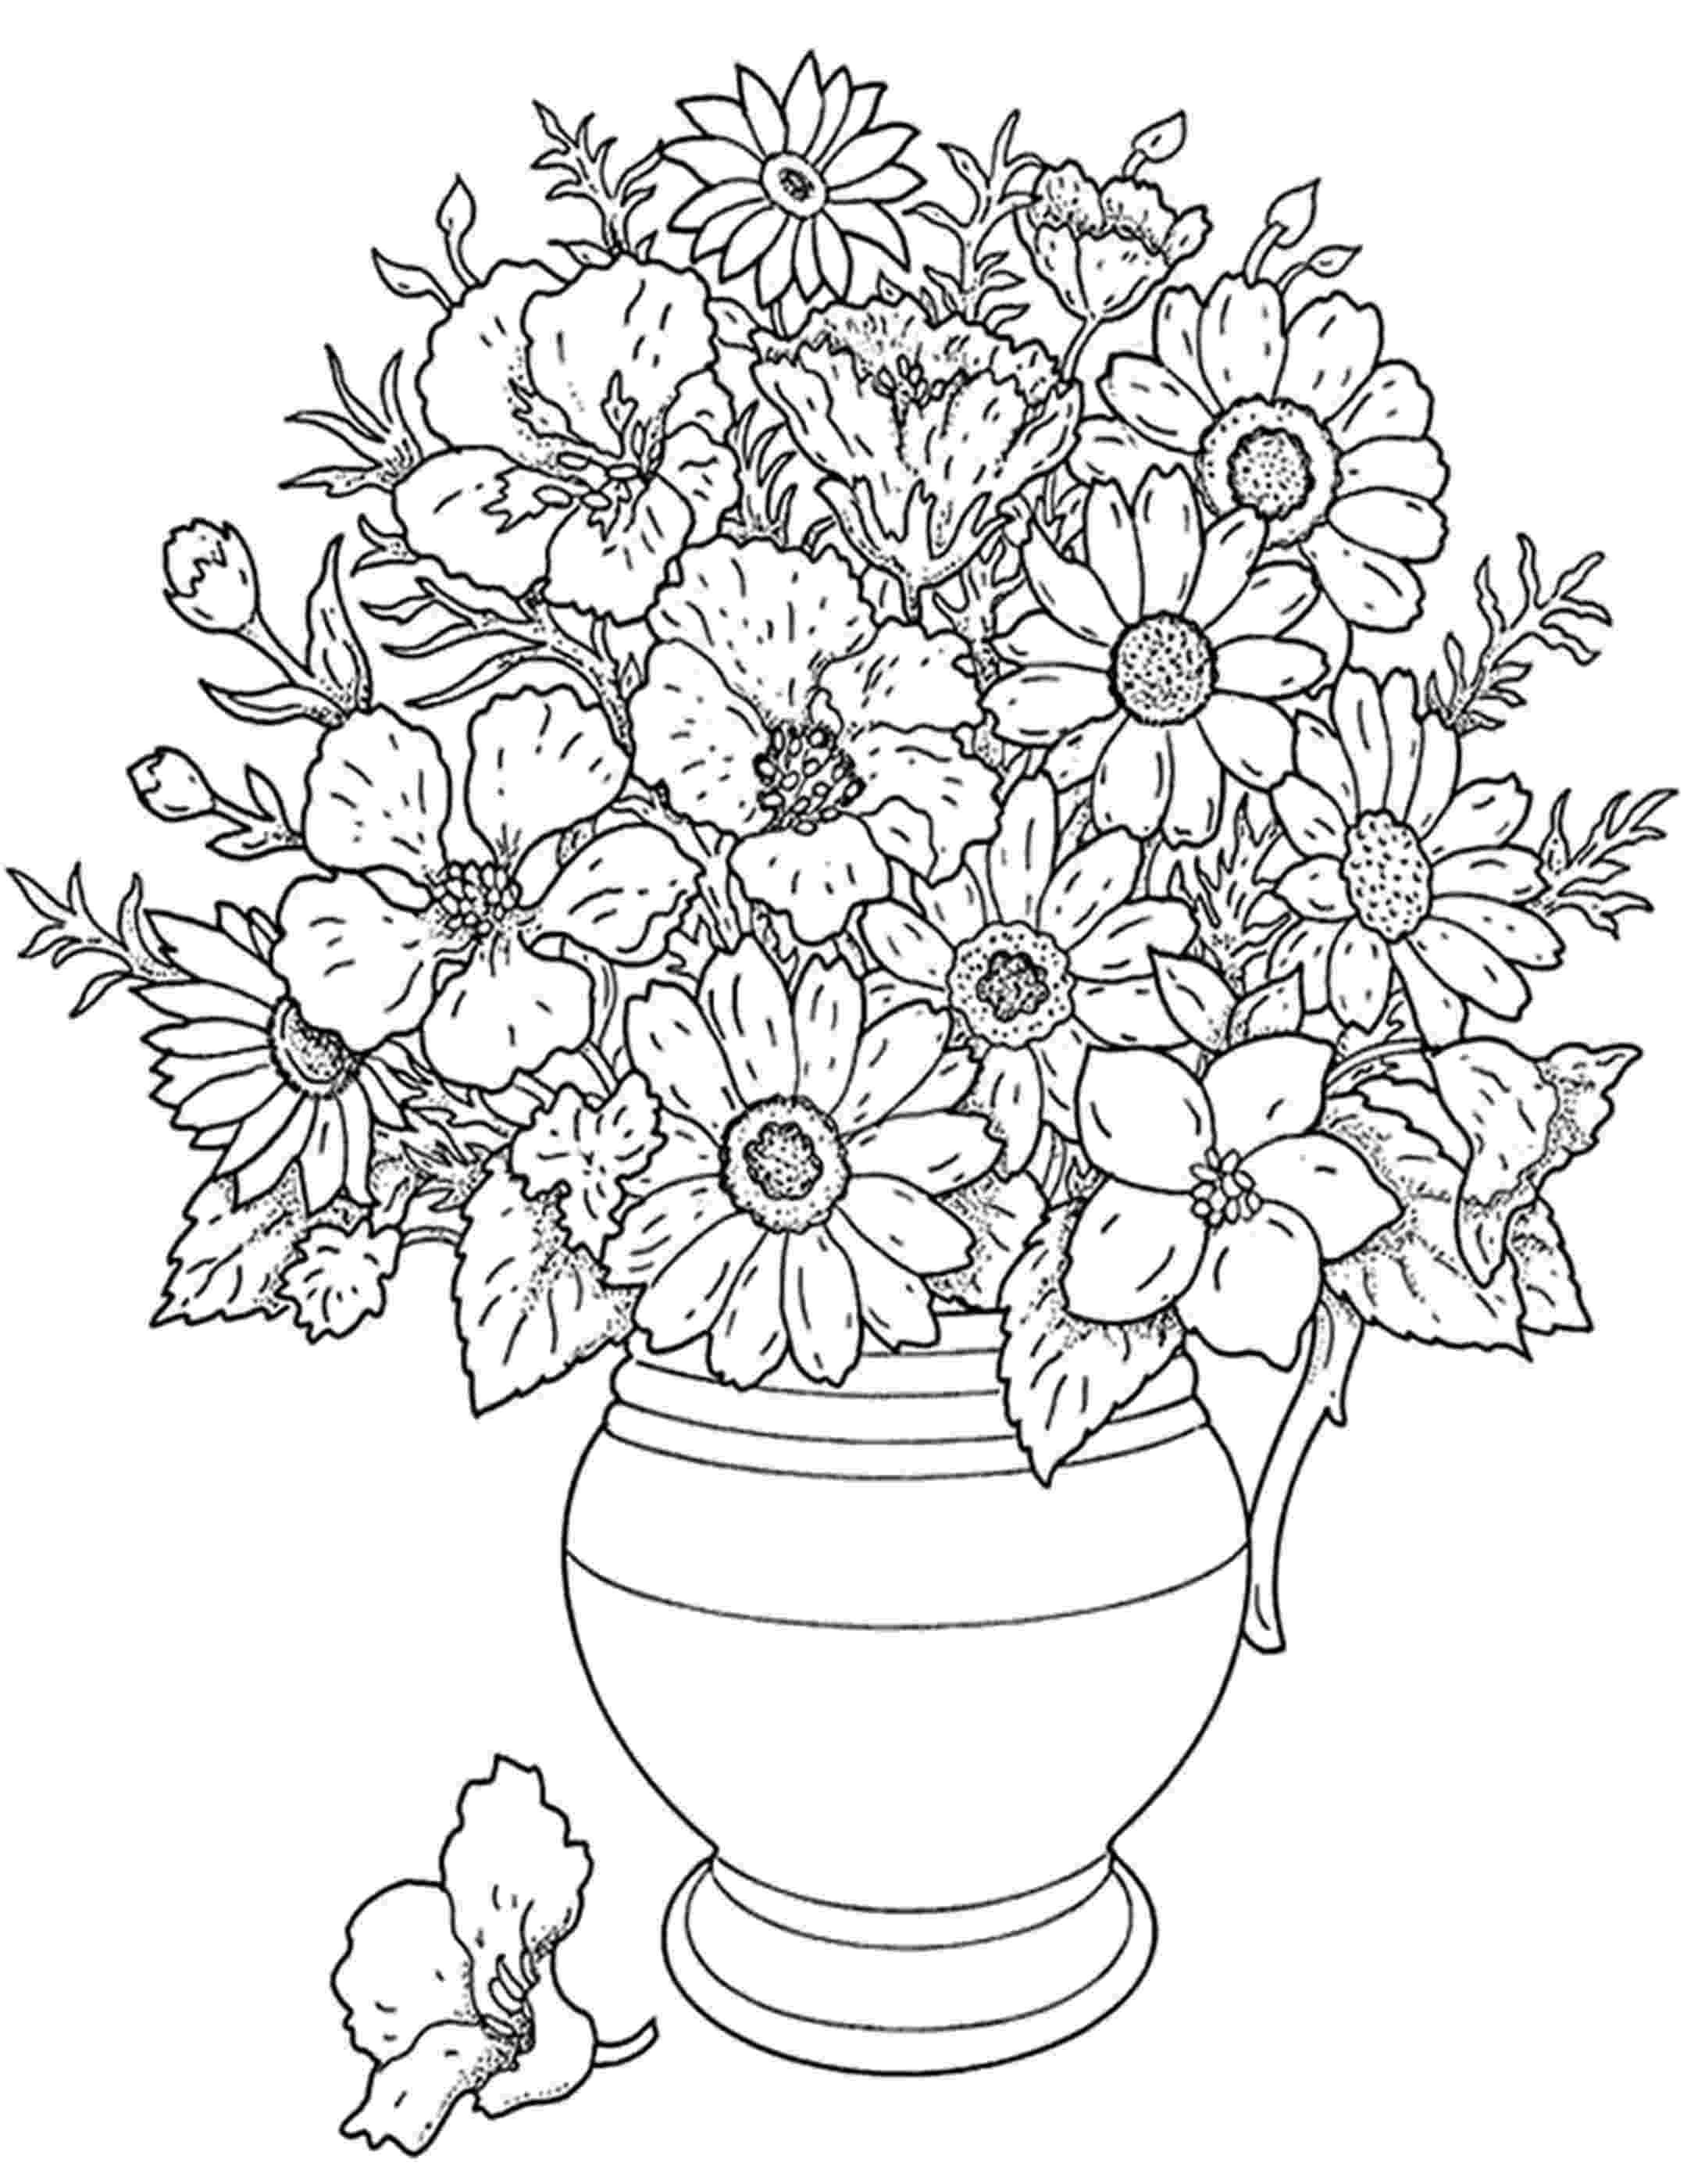 flower coloring book free printable flower coloring pages for kids best book coloring flower